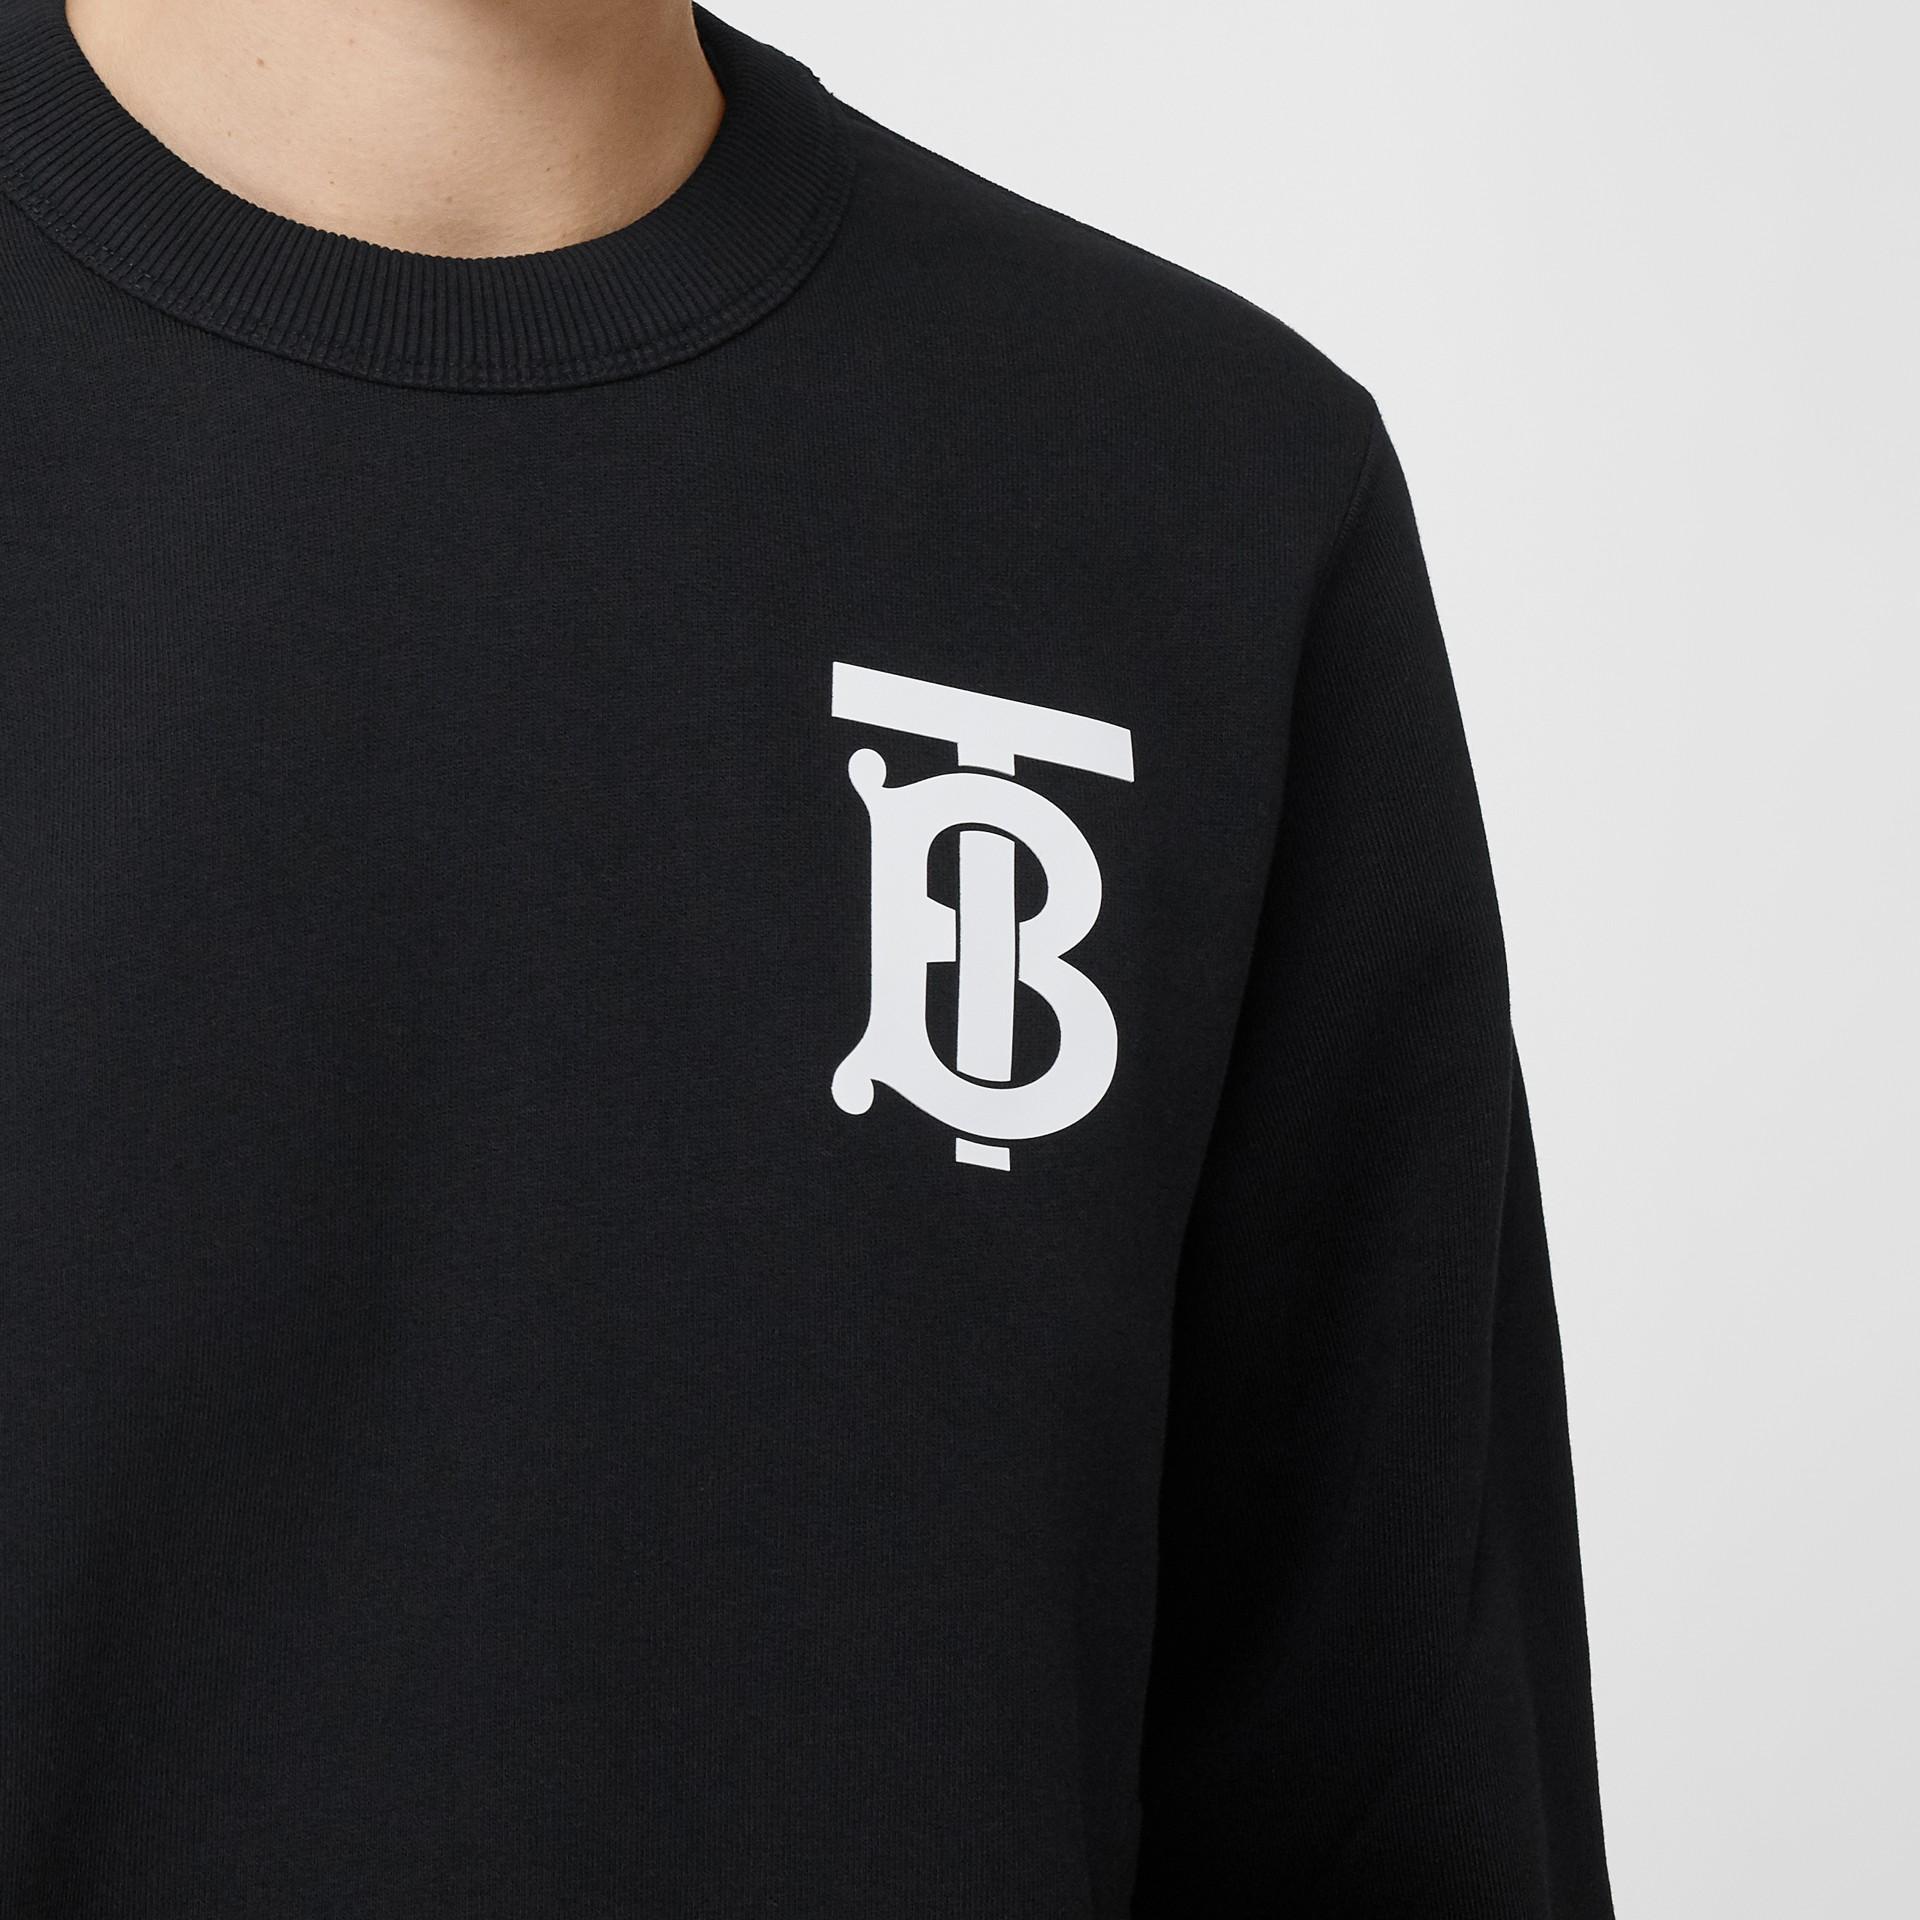 Monogram Motif Cotton Sweatshirt in Black - Women | Burberry United Kingdom - gallery image 1